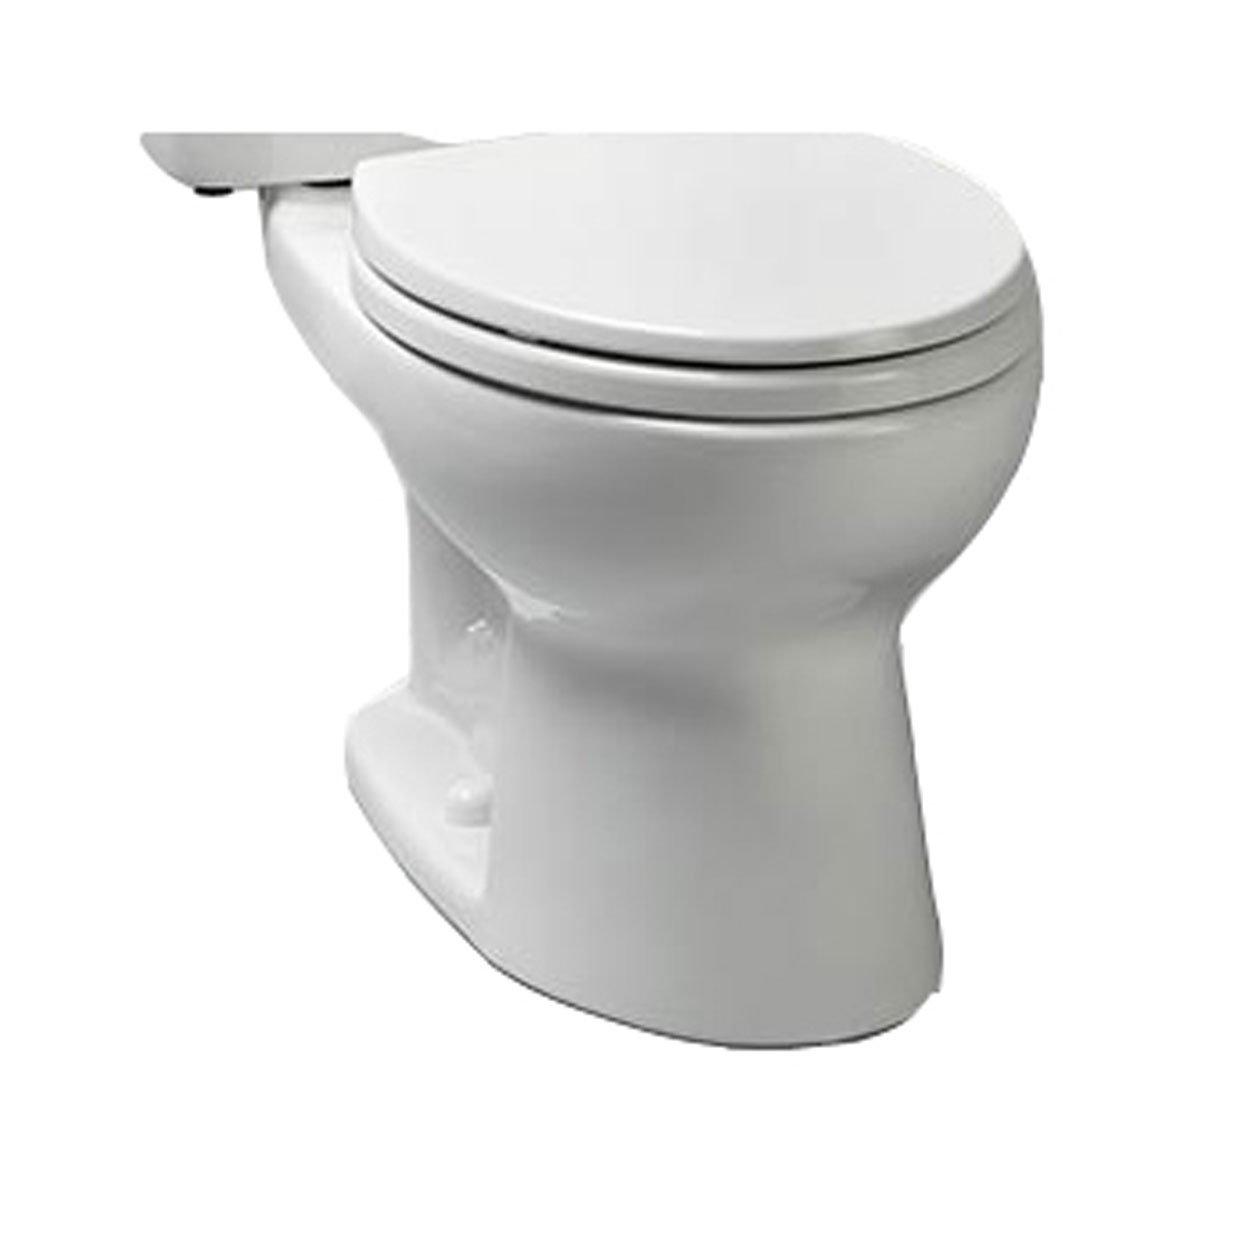 Toto CST744ELN#01 Eco-Drake Ada Elongated Bowl Toilet, Cotton by TOTO